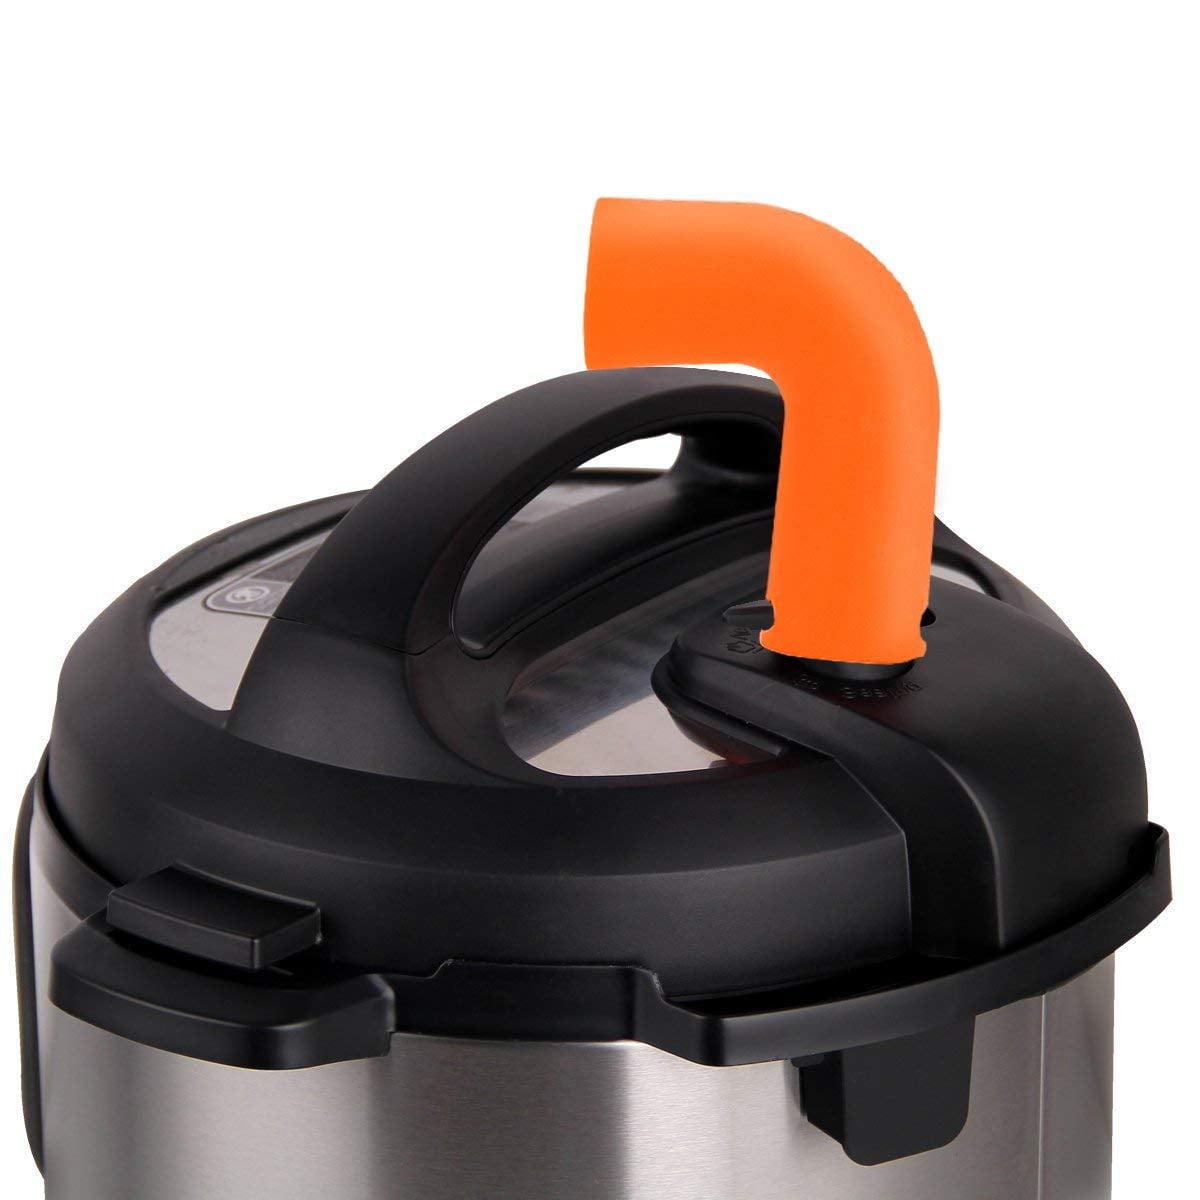 STAN Steam Diverter Instant Pot Duo Plus Smart Models Silicone Steam Release